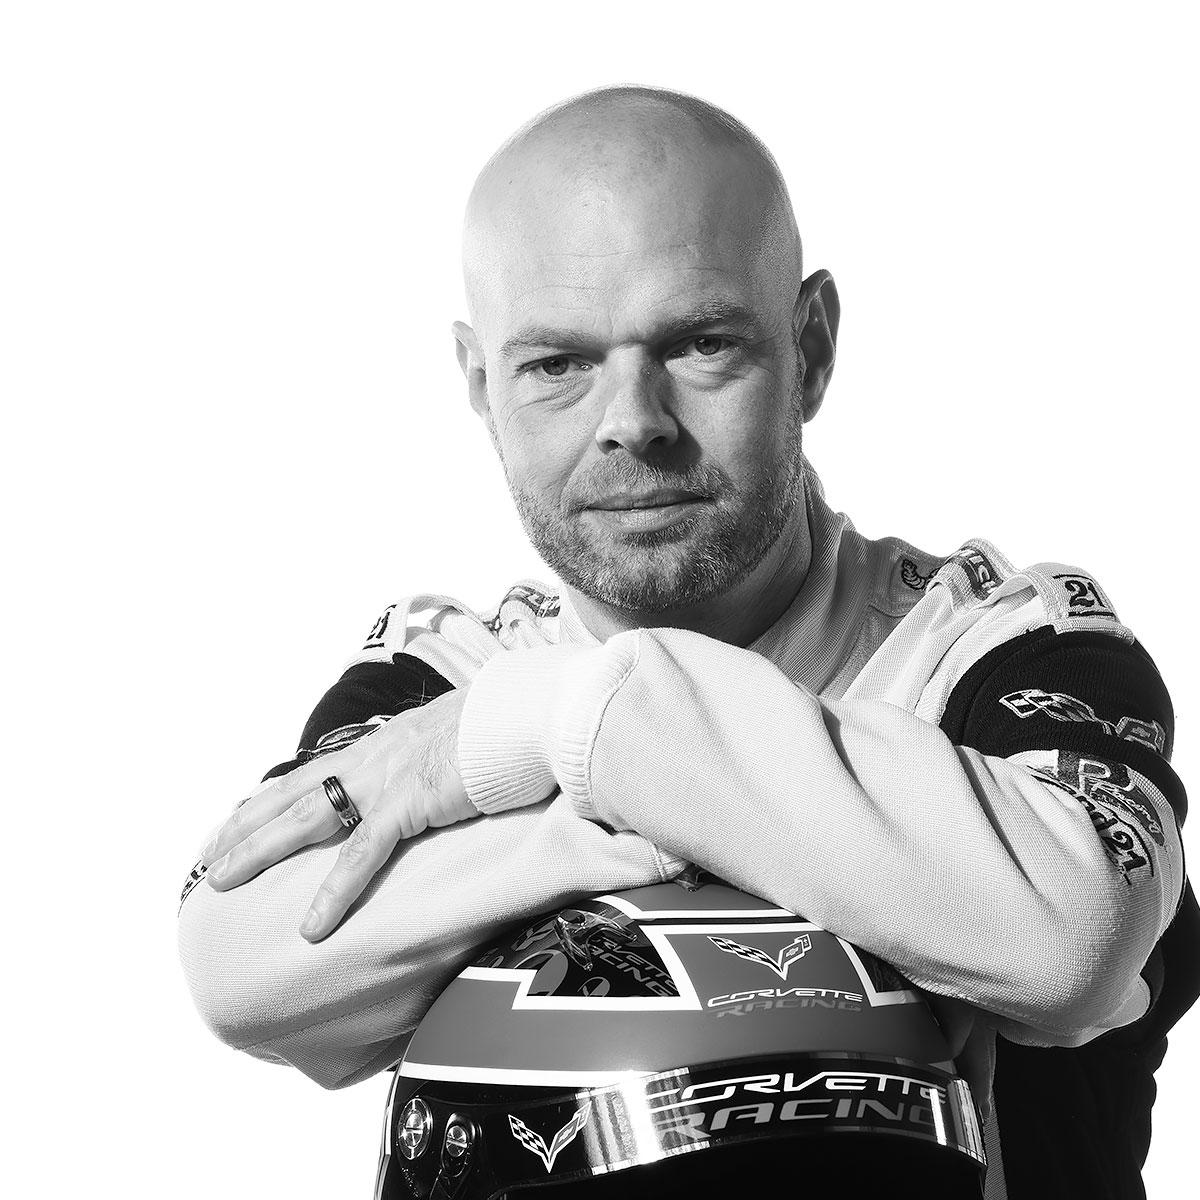 Jan Ellegaard Magnussen